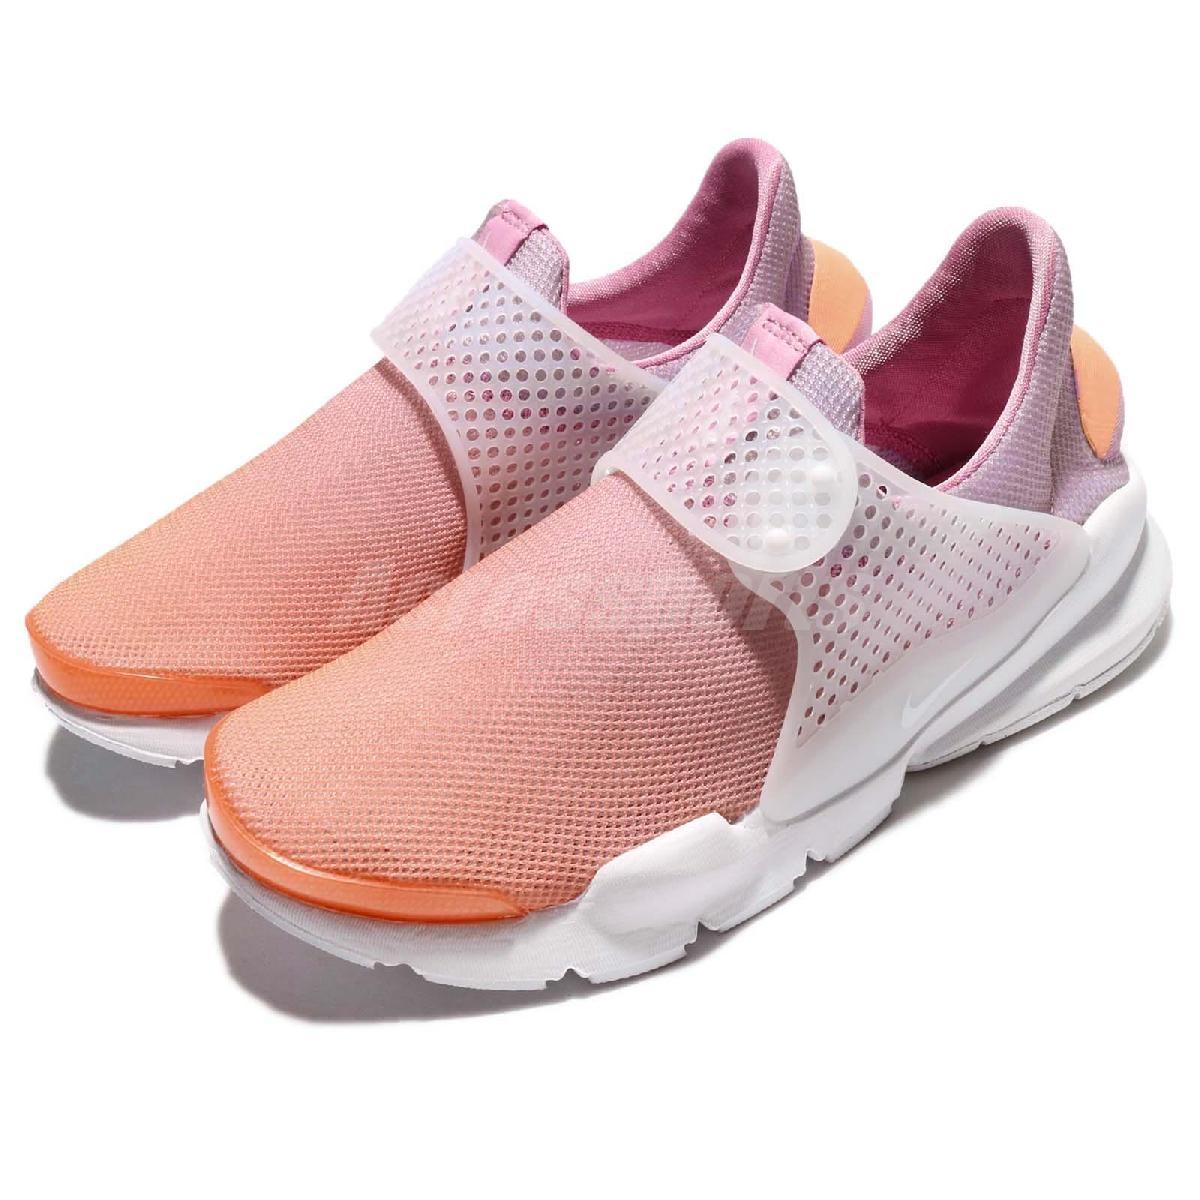 Nike Wmns Sock Dart BR Breeze橘粉紅漸層襪套球鞋襪子女鞋休閒鞋PUMP306 896446-800